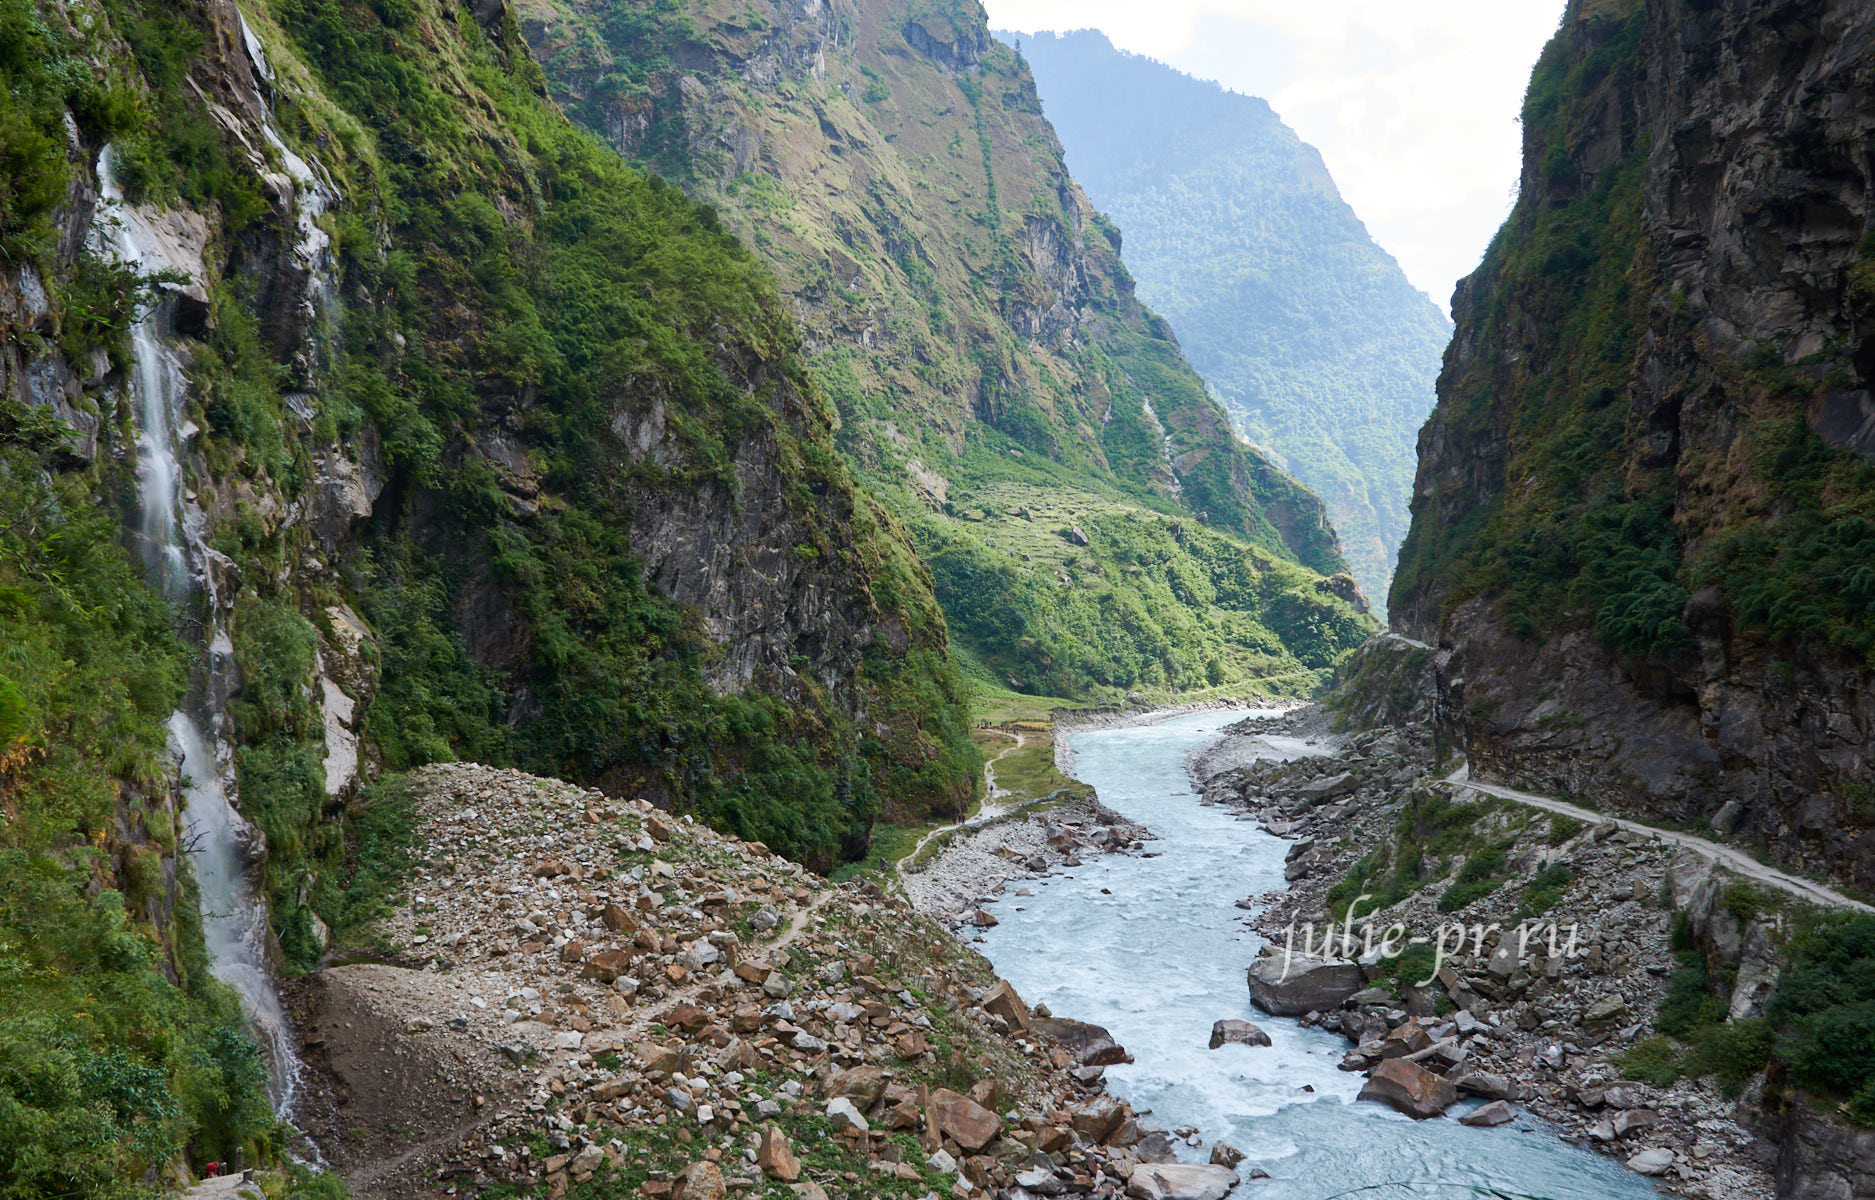 Непал, Трек вокруг Аннапурны, Ущелье реки Марсъянди